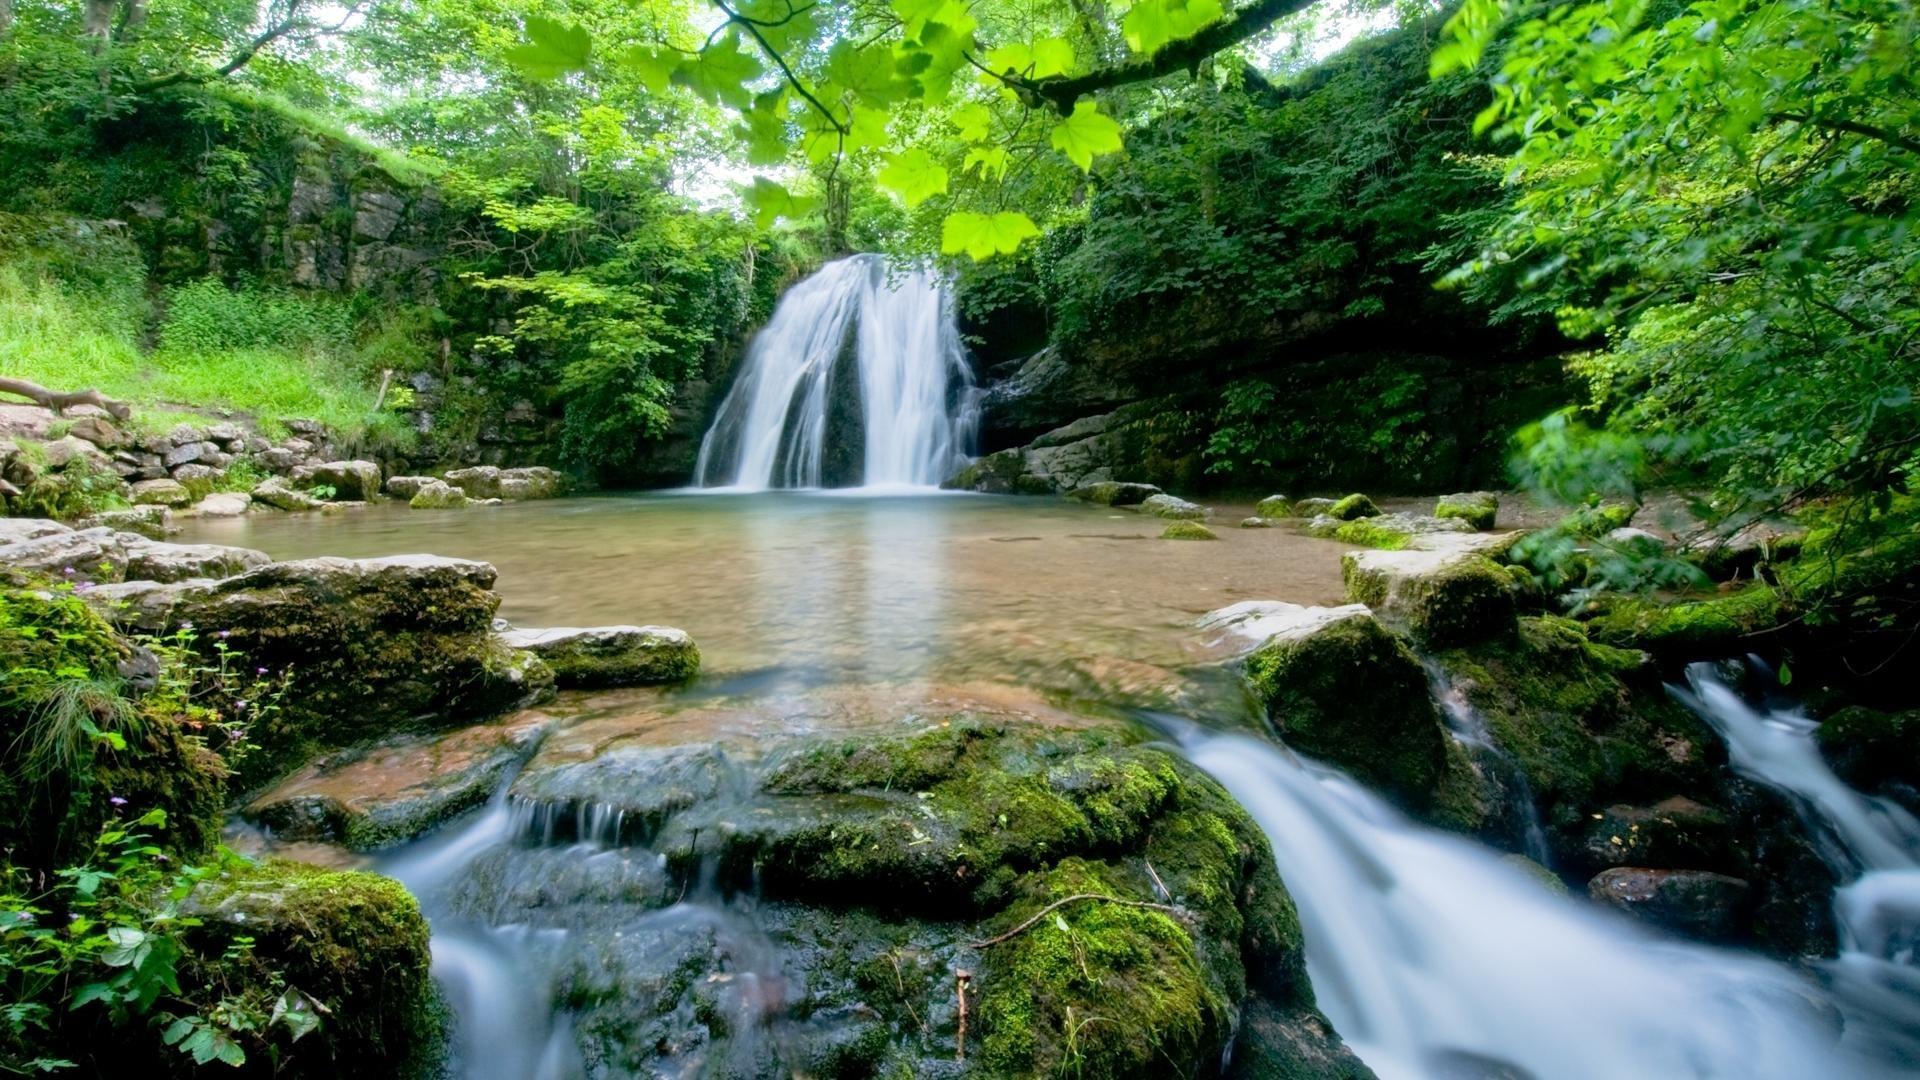 HD Waterfalls Wallpapers | Waterfall Wallpaper Hd9 Wallpaper | cards and  wallpapers | Pinterest | Waterfall wallpaper, Wallpaper and Hd wallpaper